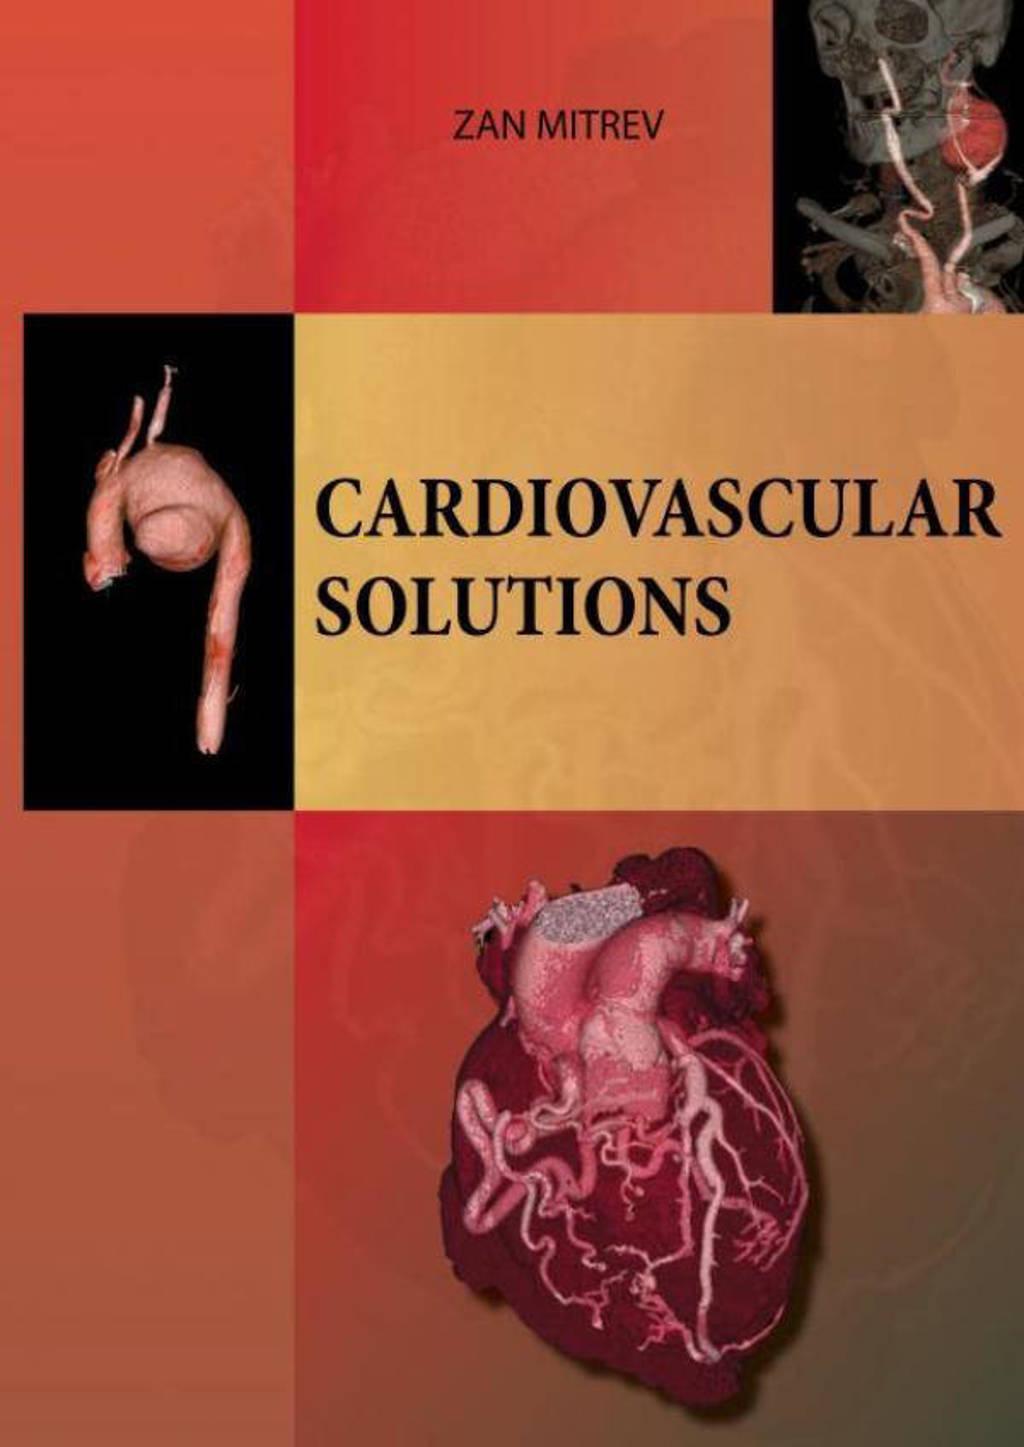 Cardiovascular Solutions - Zan Mitrev